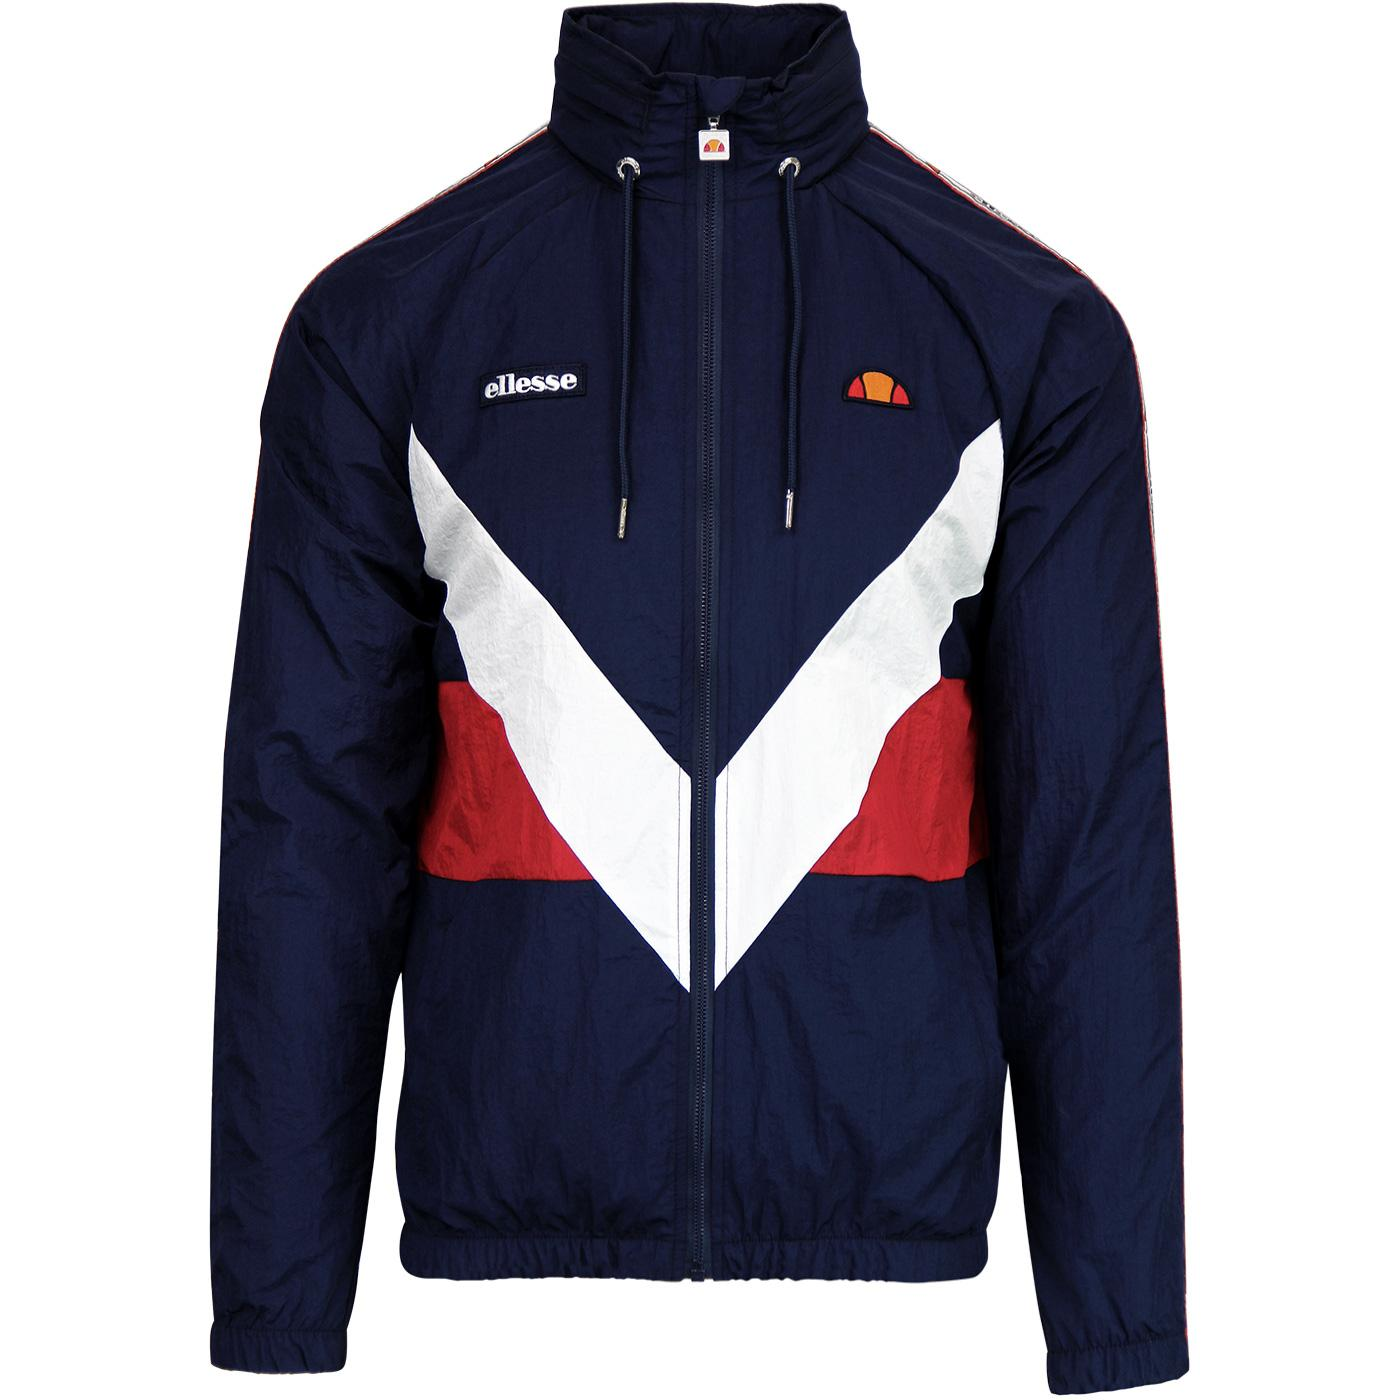 Gerano ELLESSE Retro 80s Shell Suit Jacket in Navy